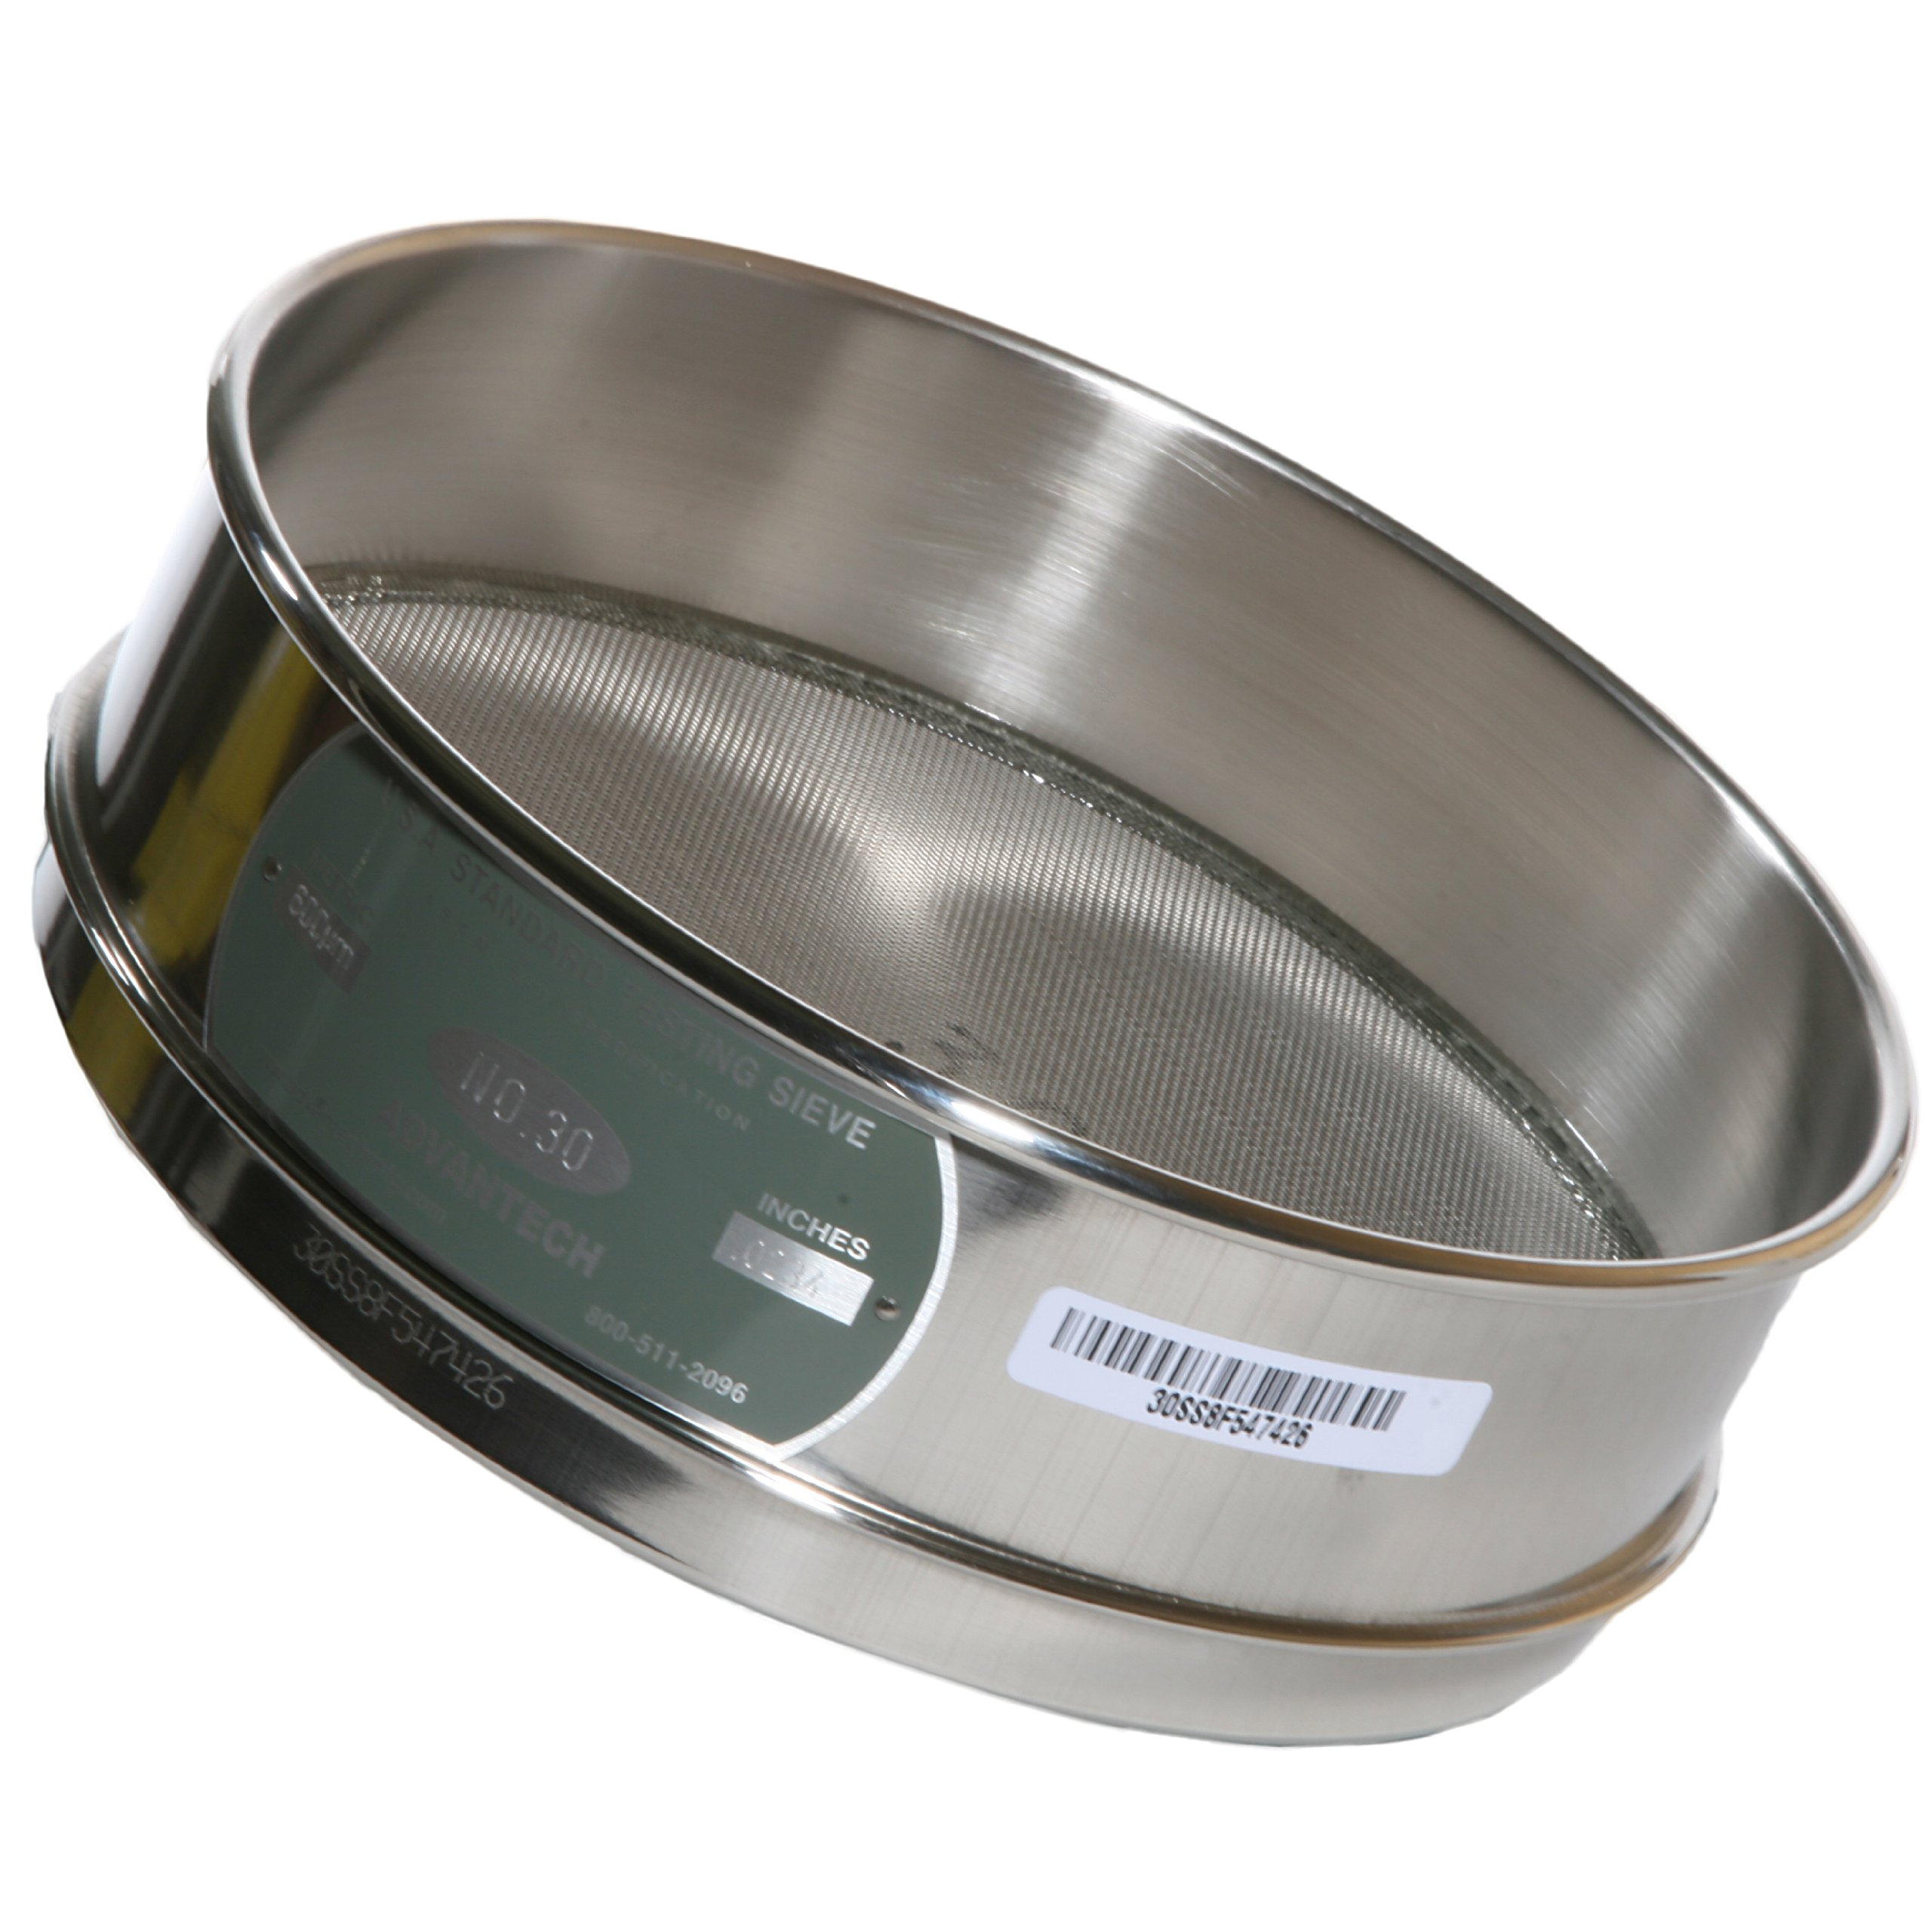 Advantech Stainless Steel Test Sieves, 8'' Diameter, #30 Mesh, Full Height by Advantech (Image #1)